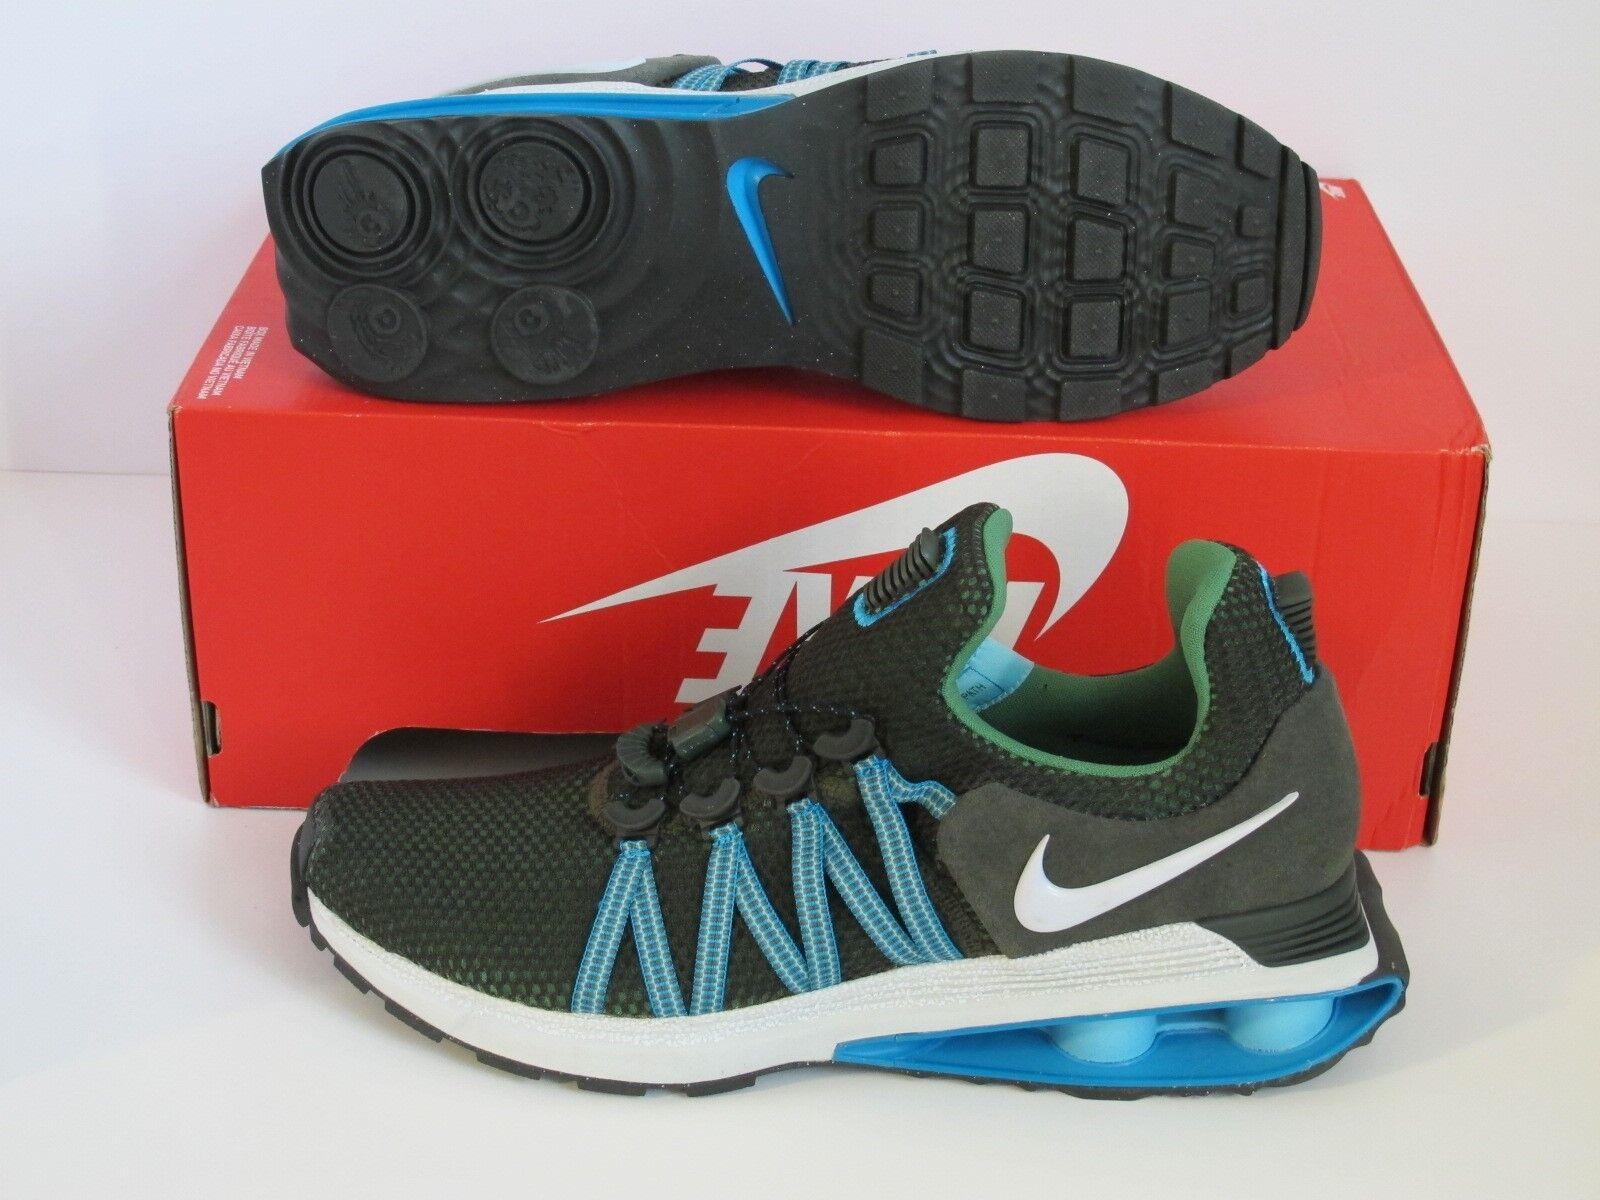 NEW Nike Shox Gravity Men's Running shoes Sz 10